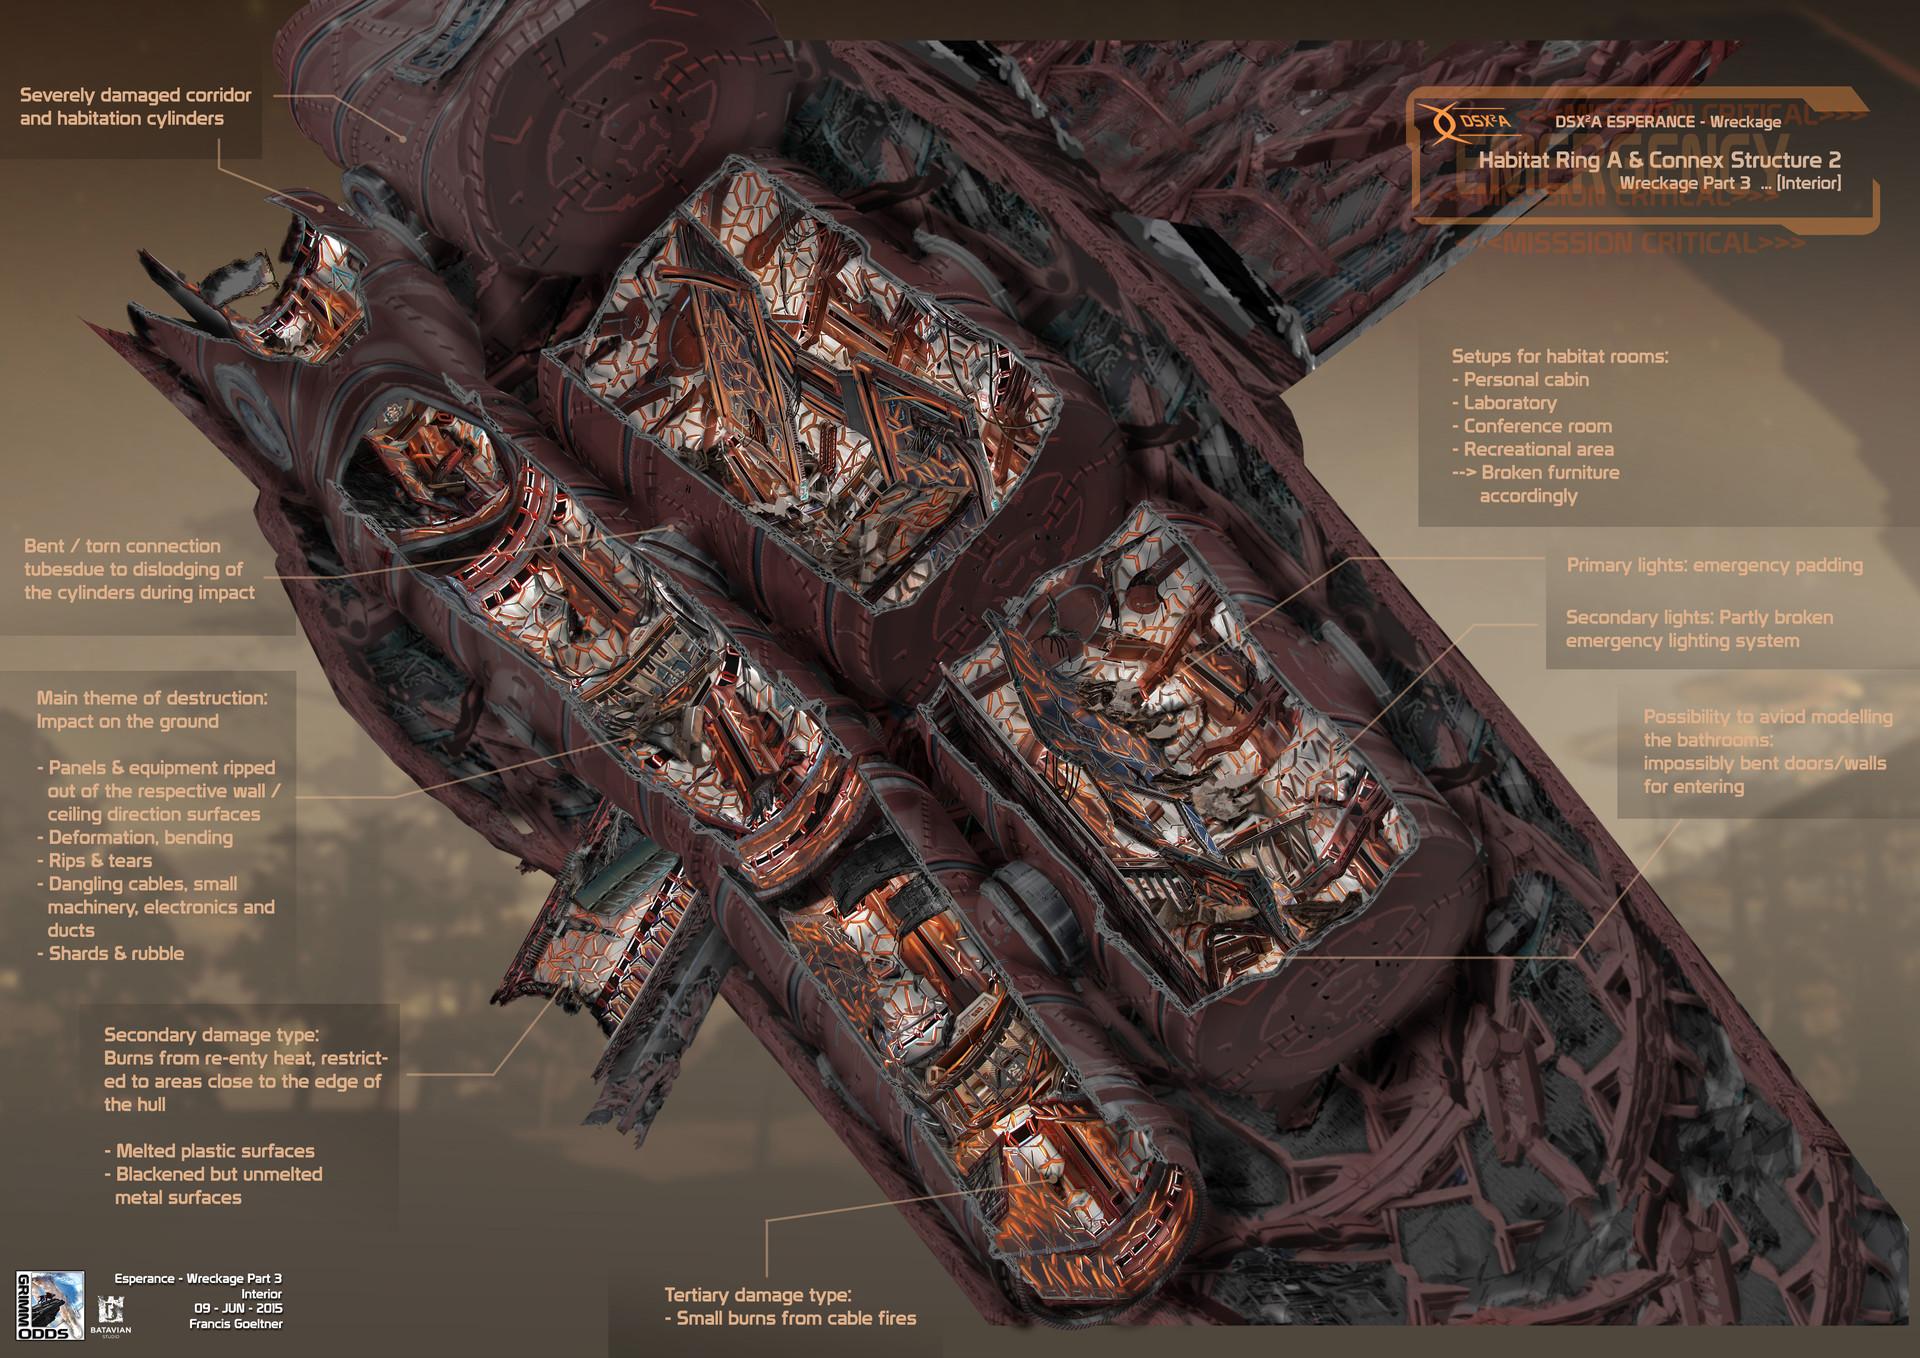 Grimm Odds - Spaceship wreckage interior - Room location and deformation